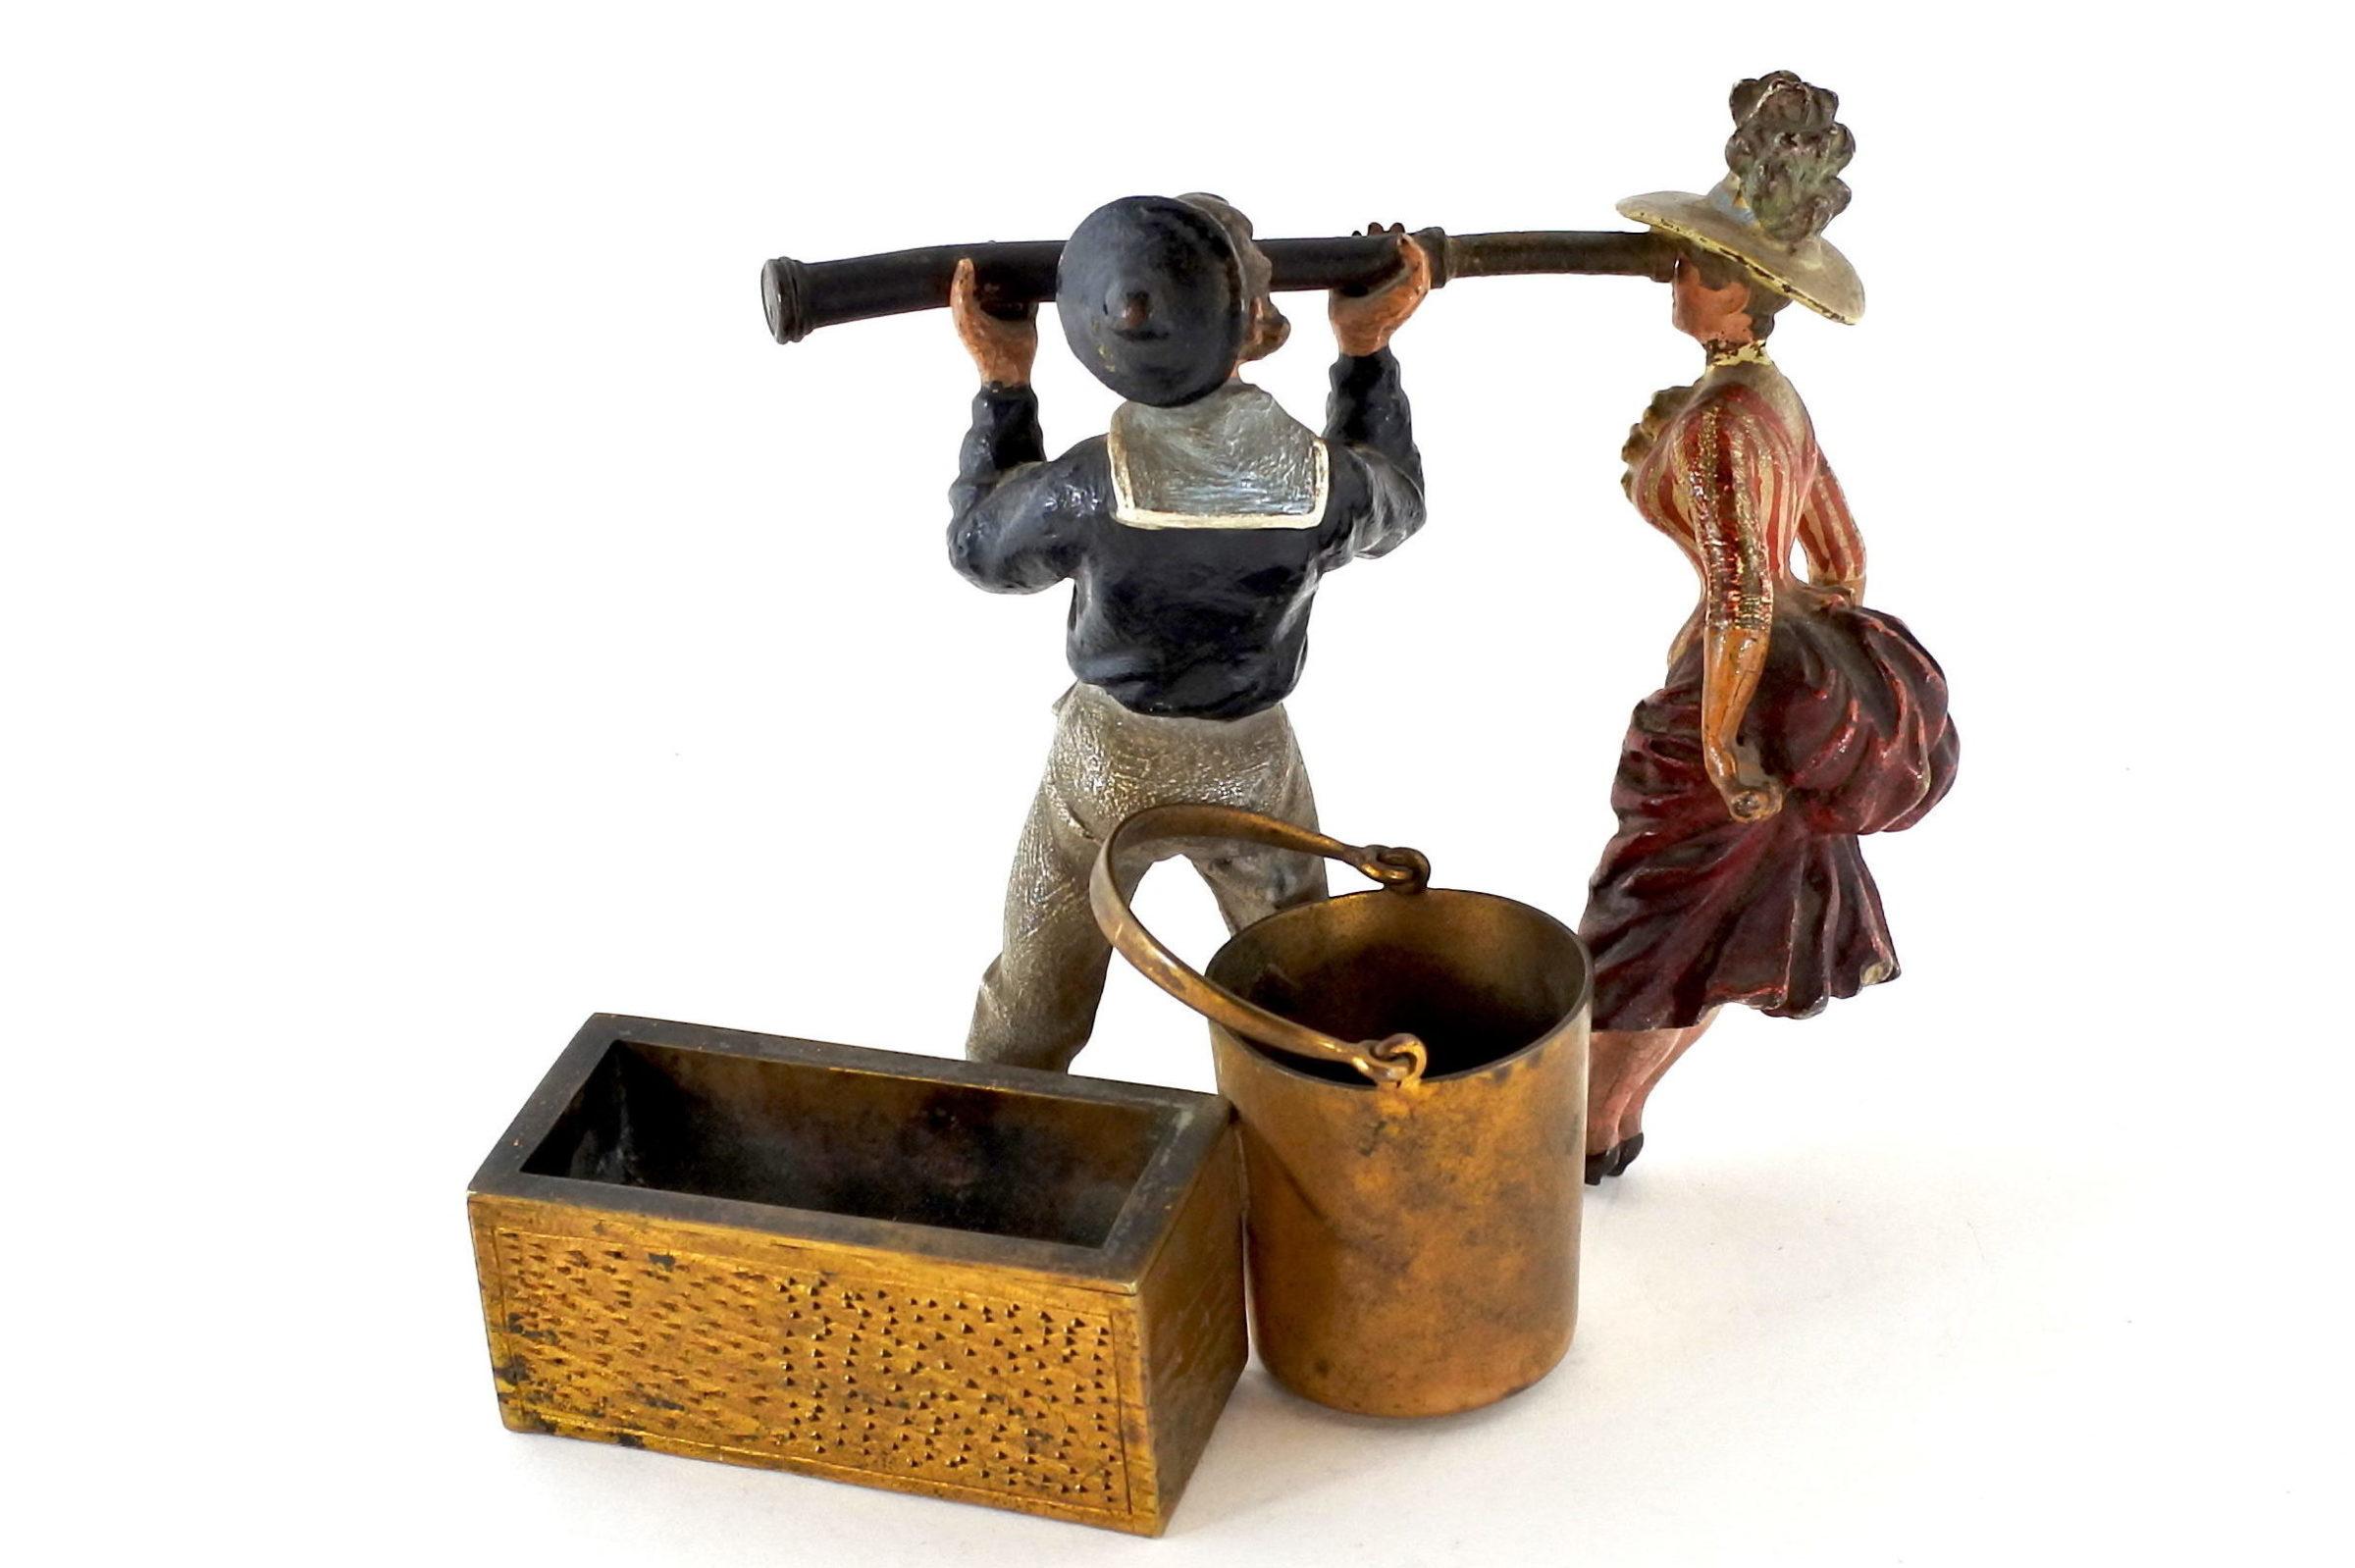 Bronzo di Vienna policromo - Donna con cannocchiale e marinaio - 3